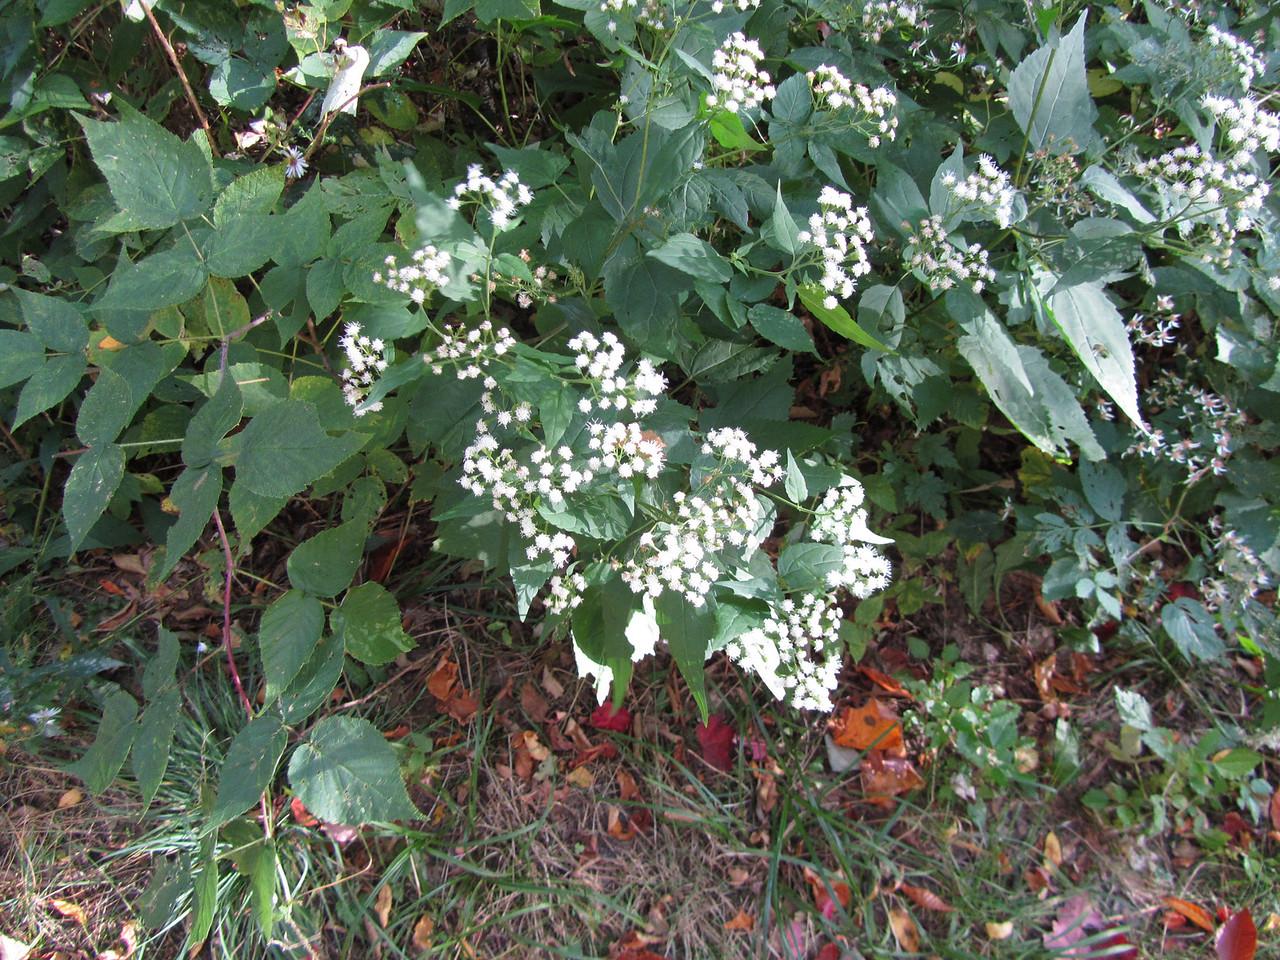 Pretty flowers. Rob pee'd on them.